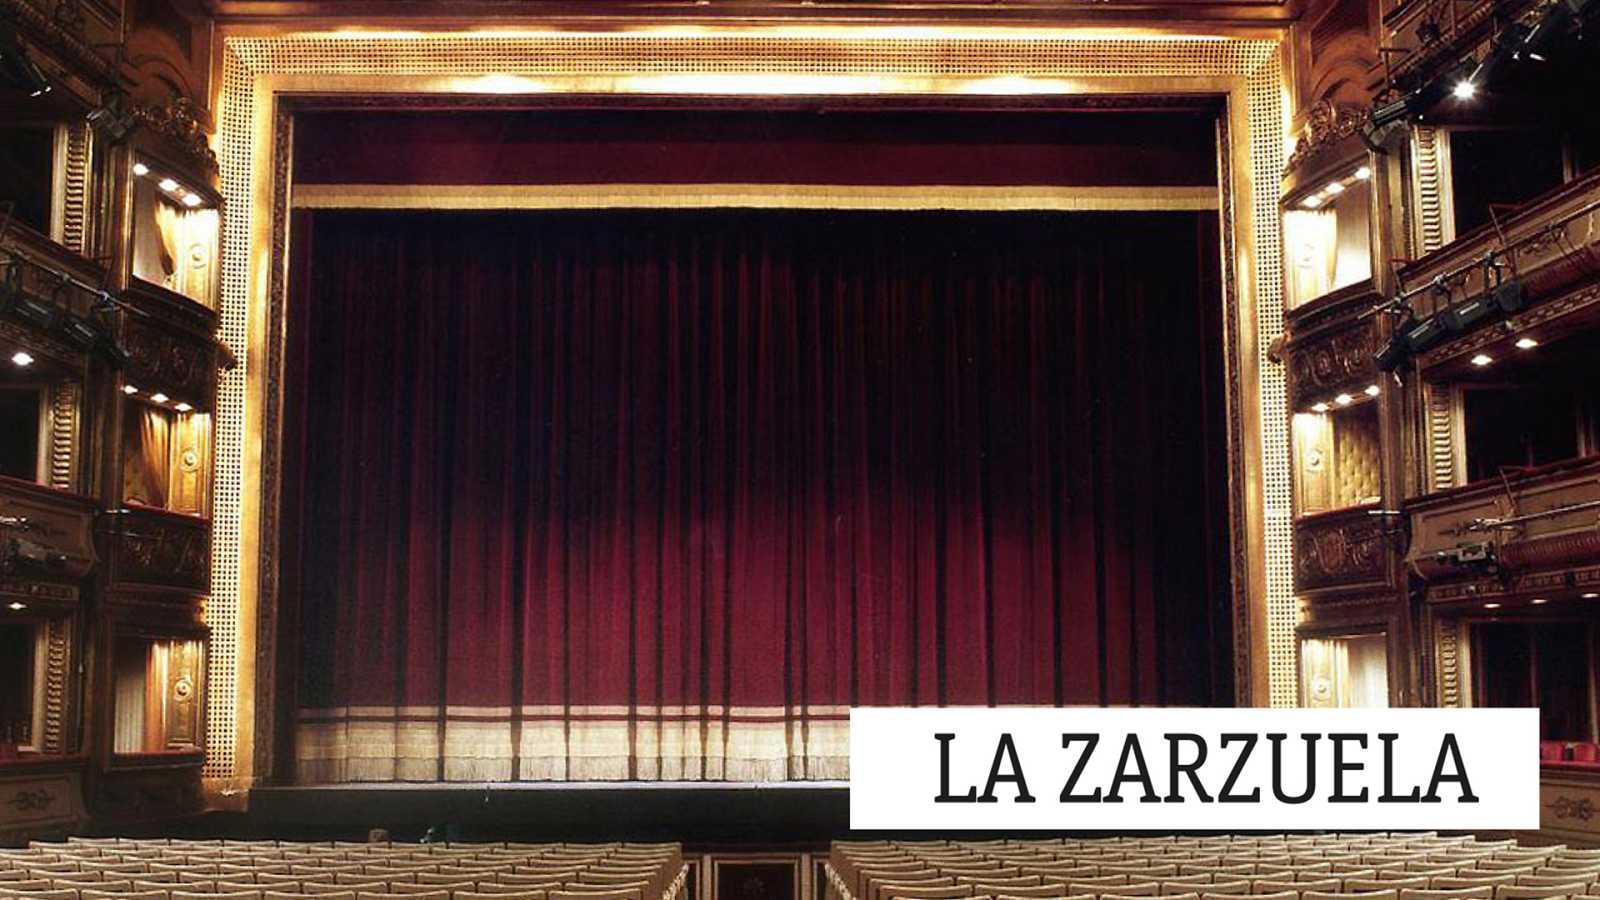 La zarzuela - Luis Sagi-Vela - 17/02/21 - escuchar ahora